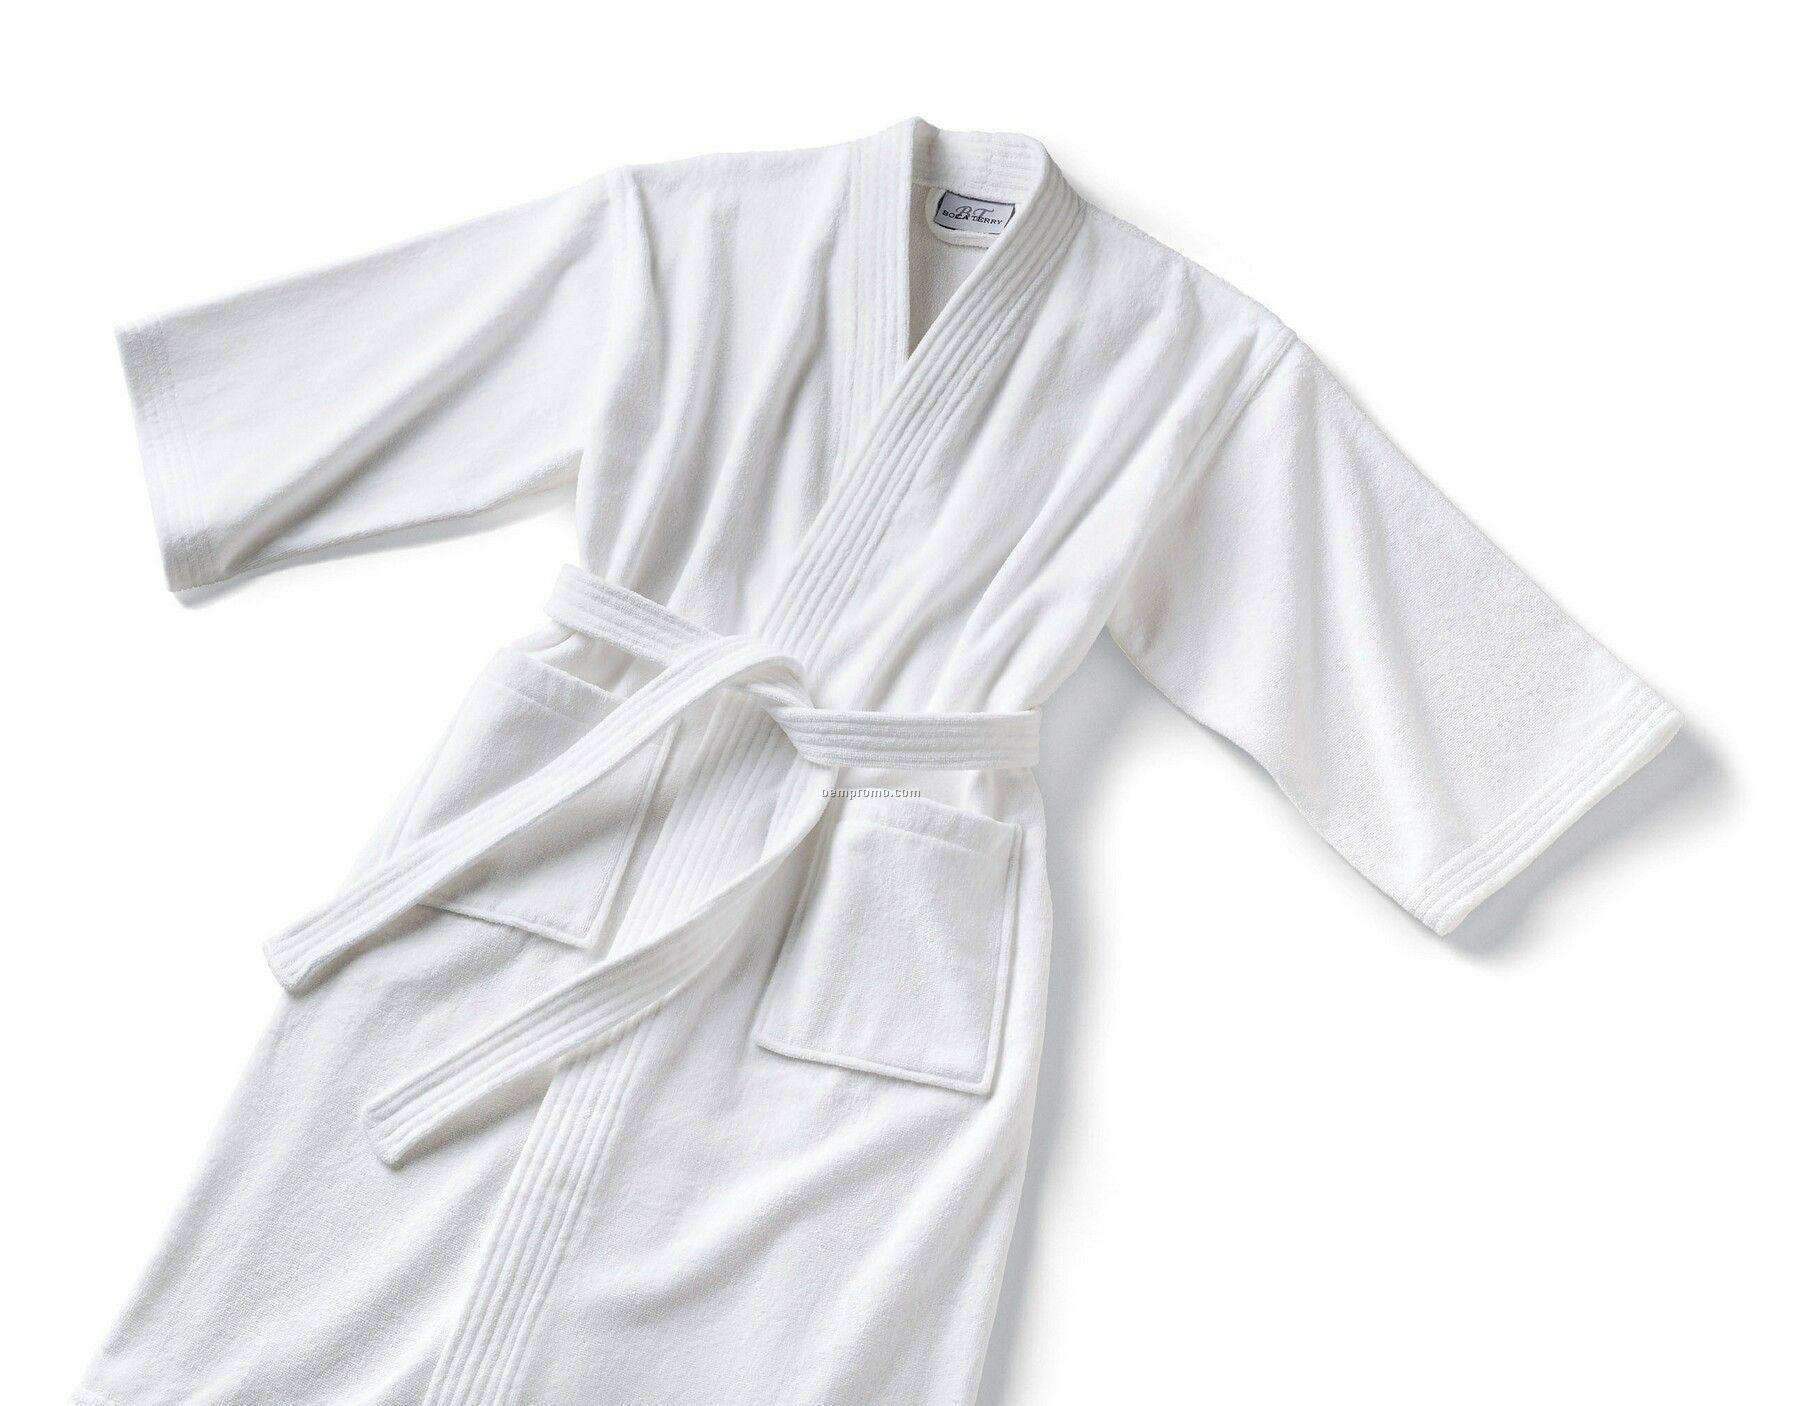 Kimono Waffle Robe - Multi Waffle (Cotton/Poly Blend)